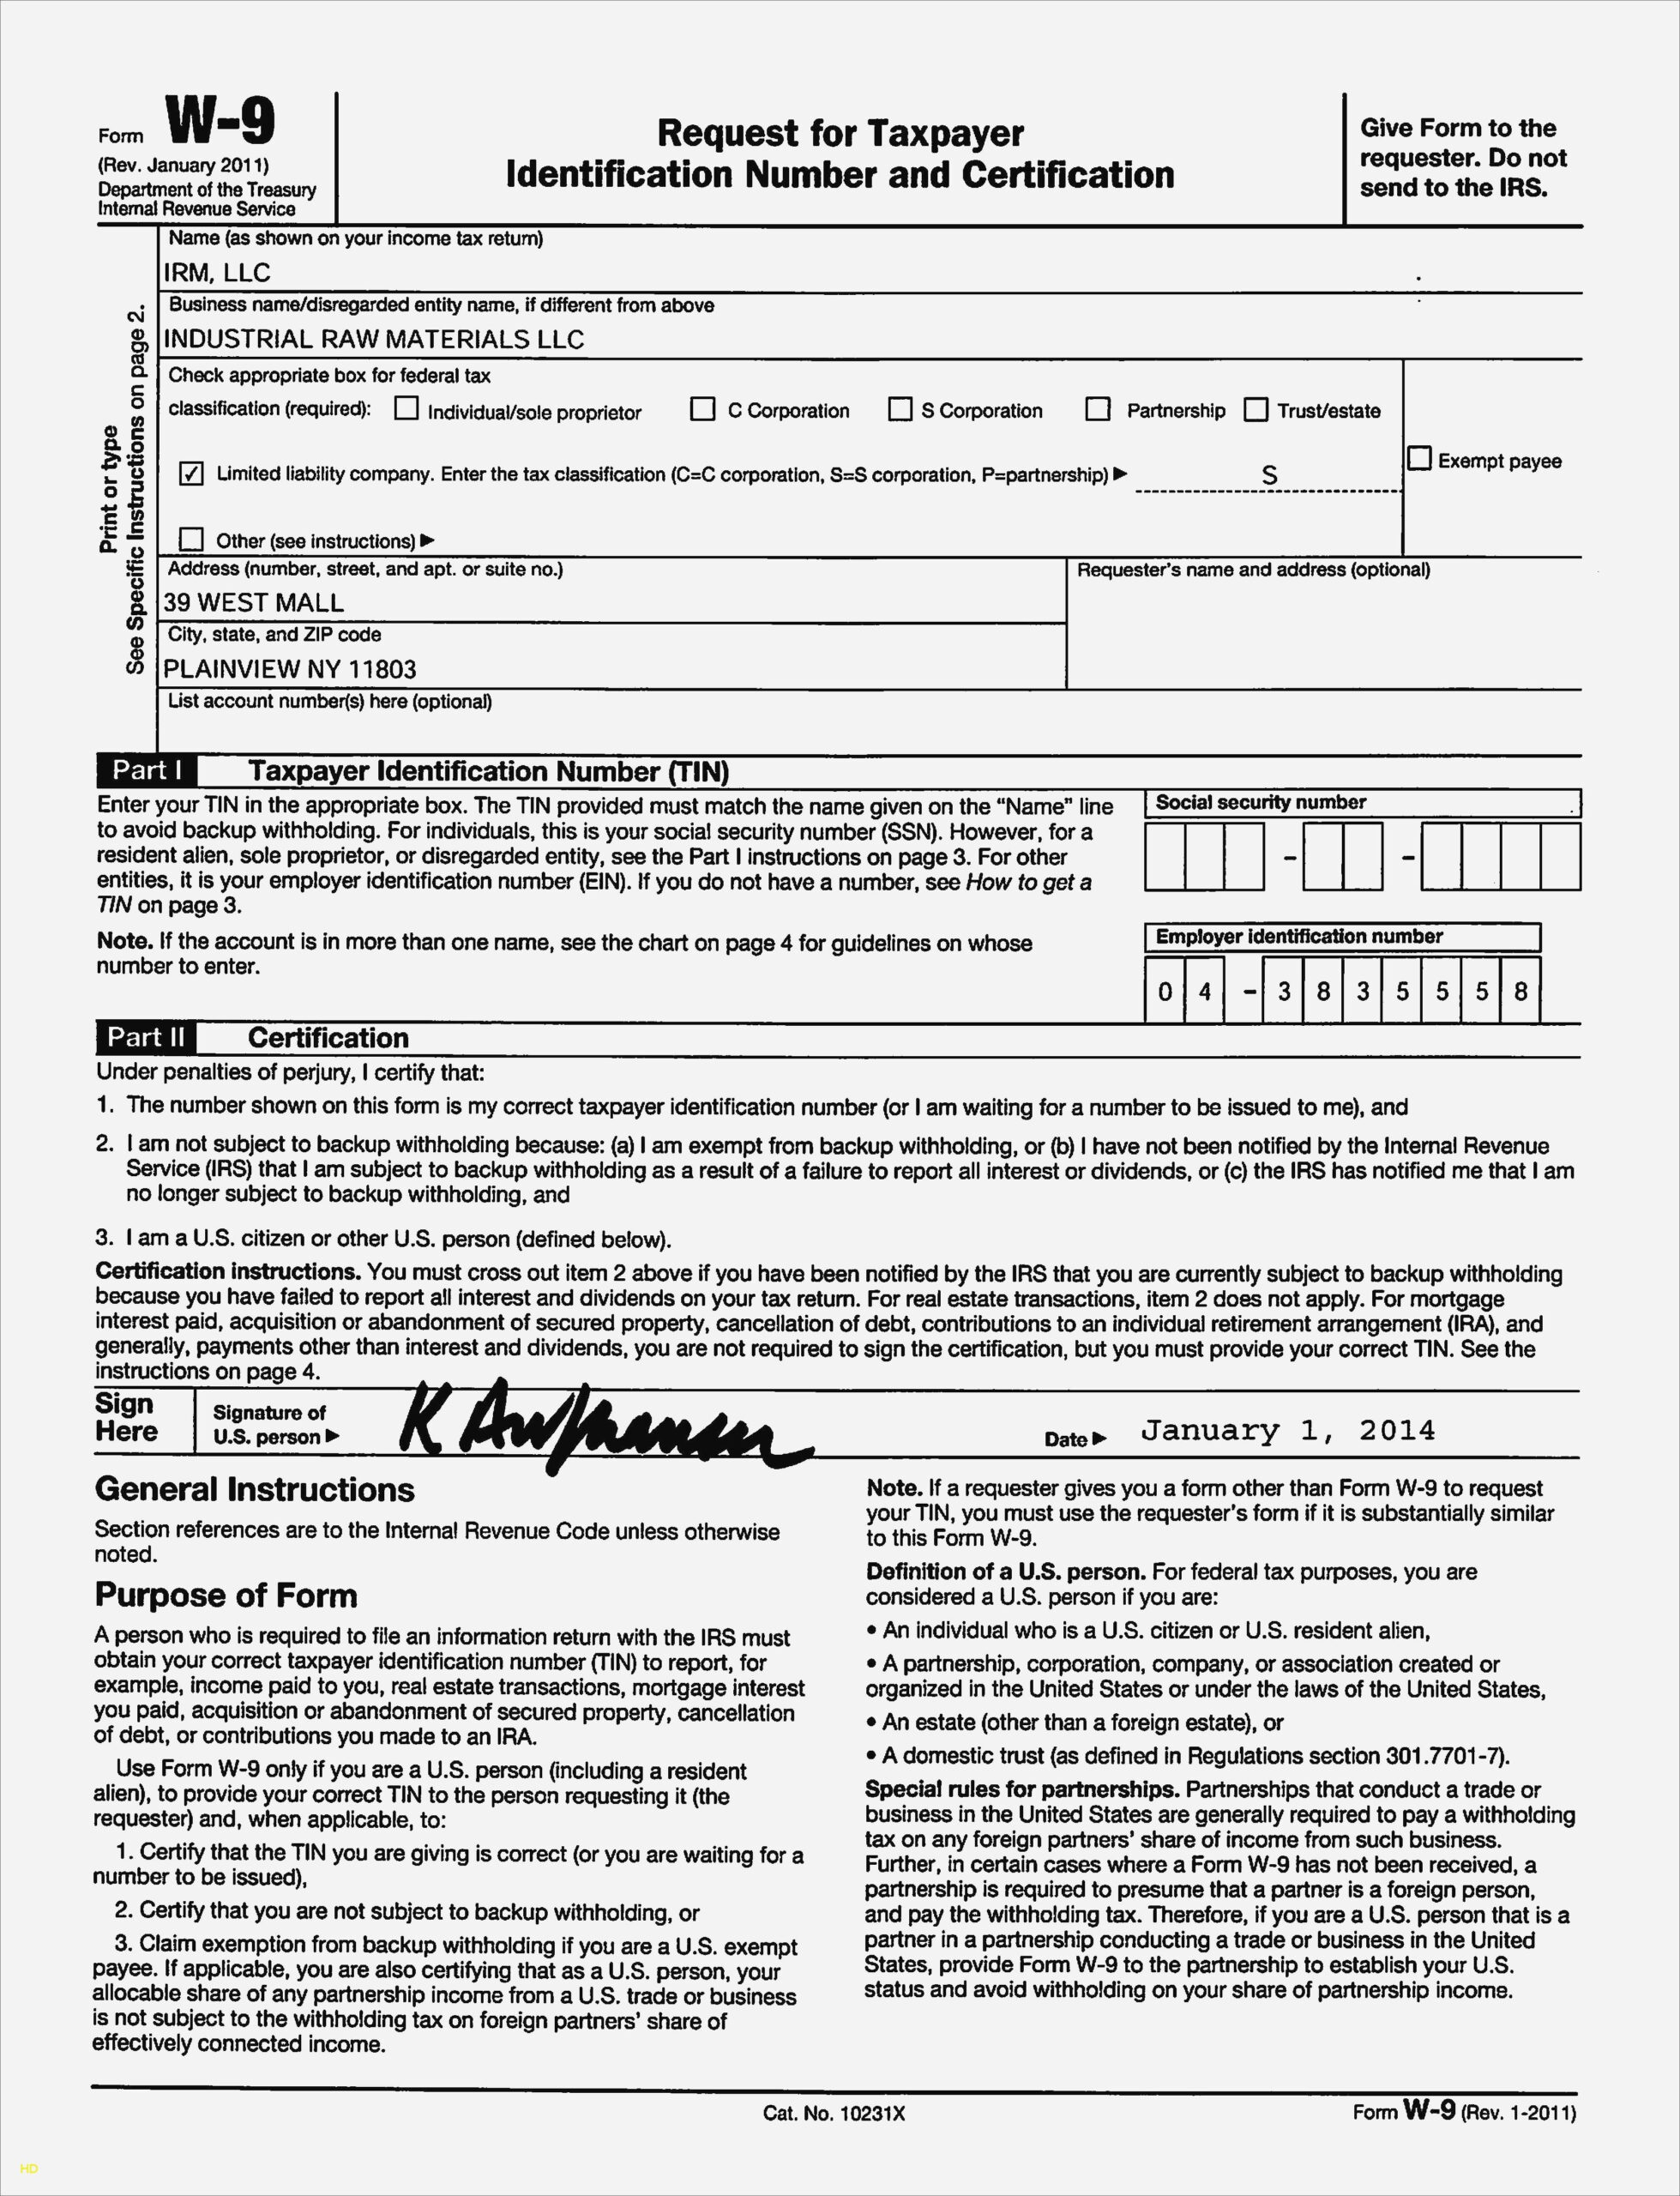 W9 Forms 2021 Printable Free | Calendar Printable Free regarding W-9 Form 2021 Printable Pdf